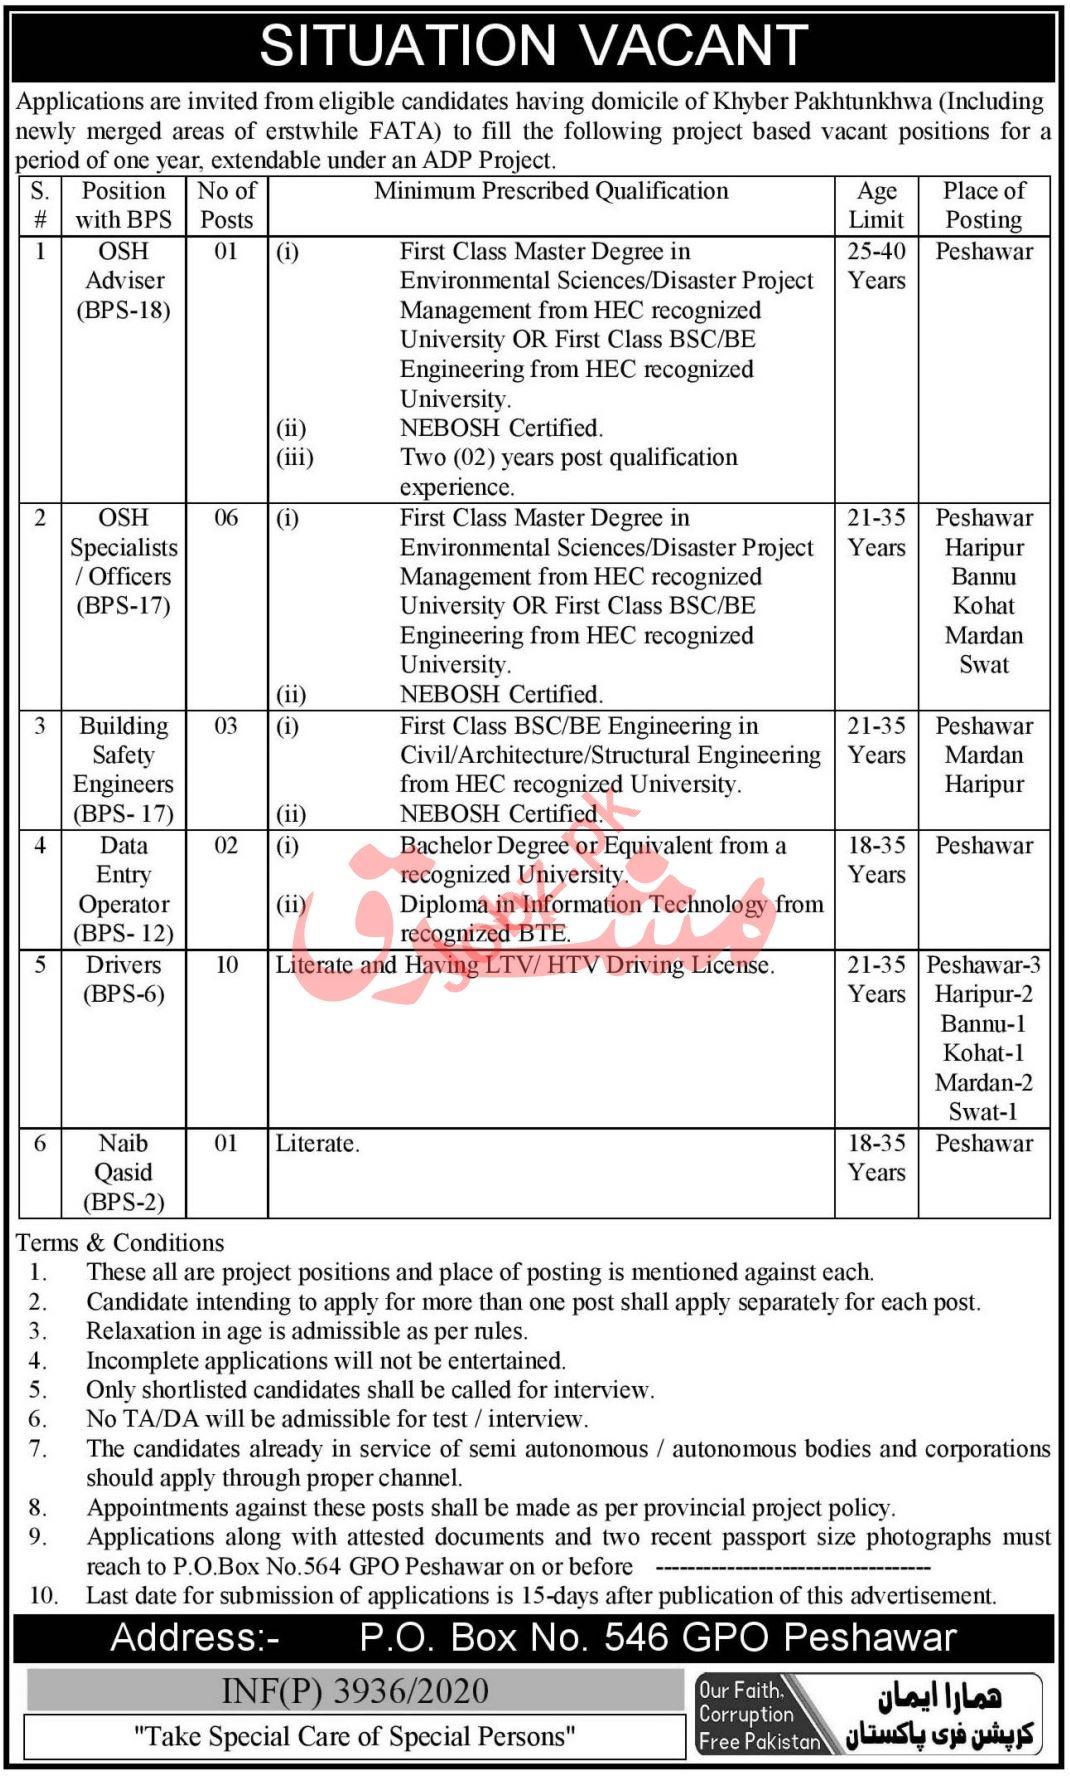 P O Box No 546 GPO Peshawar Jobs 2020 for OSH Adviser